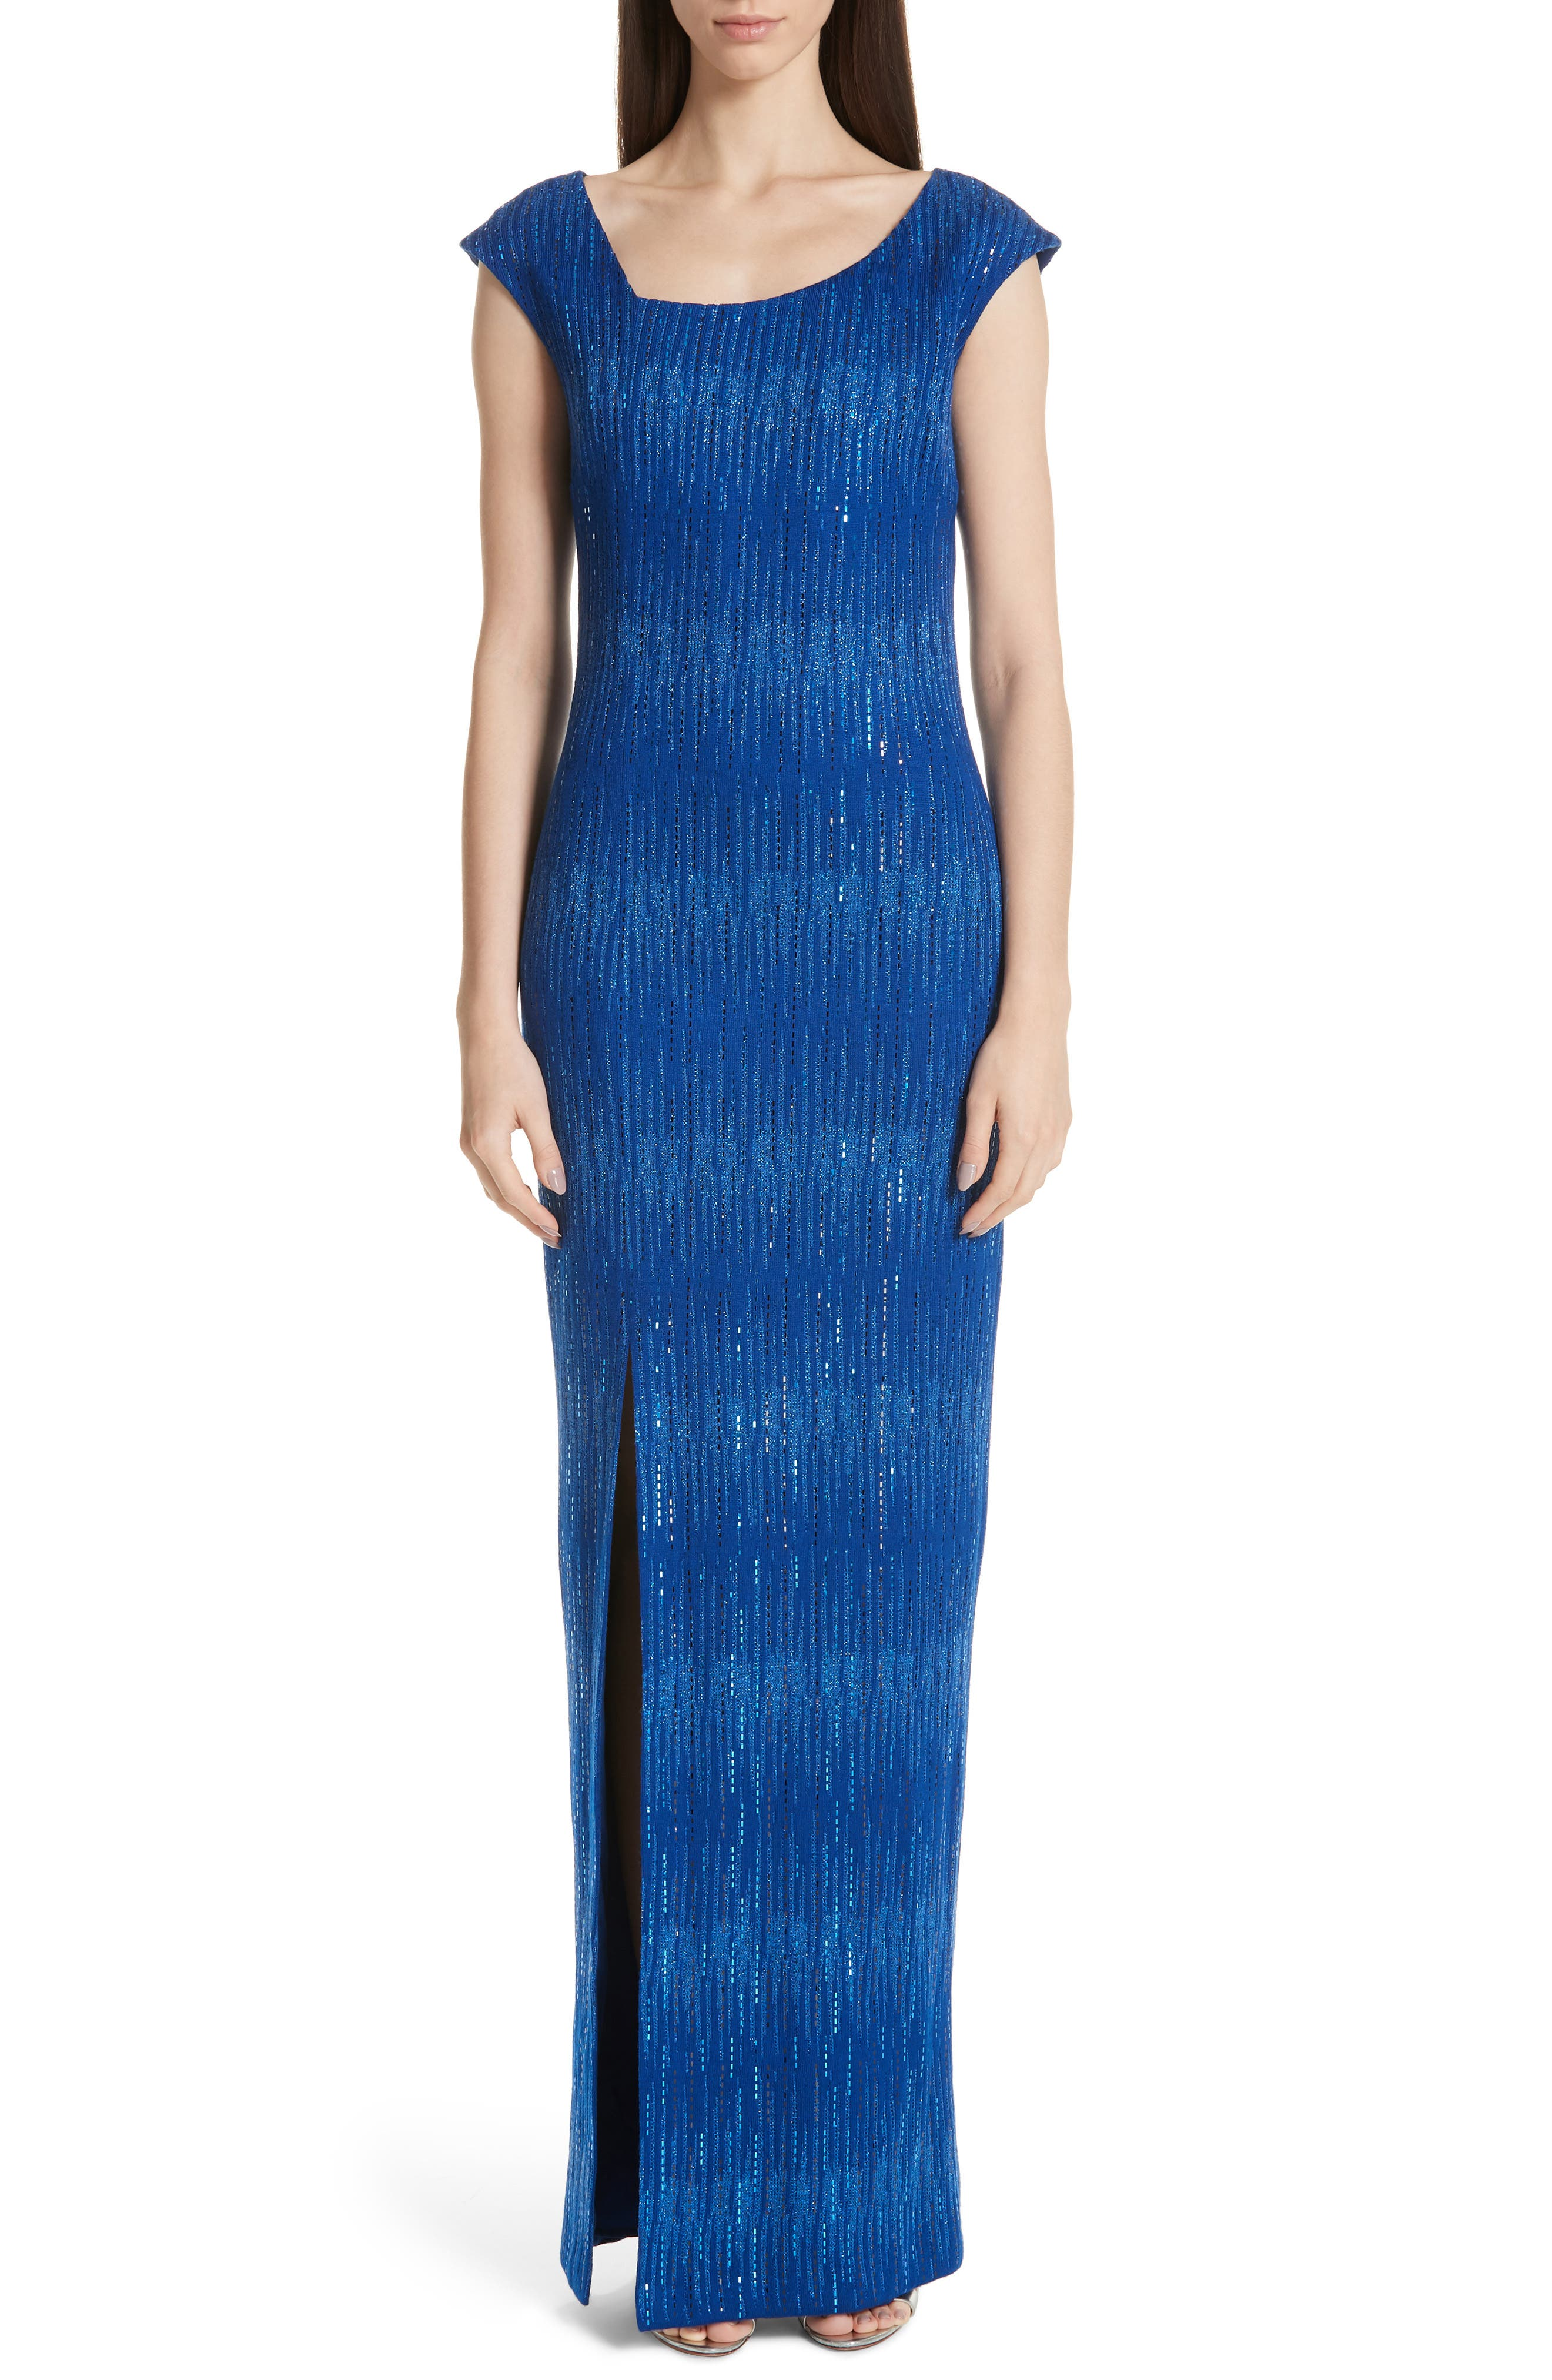 ST. JOHN COLLECTION, Asymmetrical Neck Carrie Knit Evening Dress, Main thumbnail 1, color, AZUL